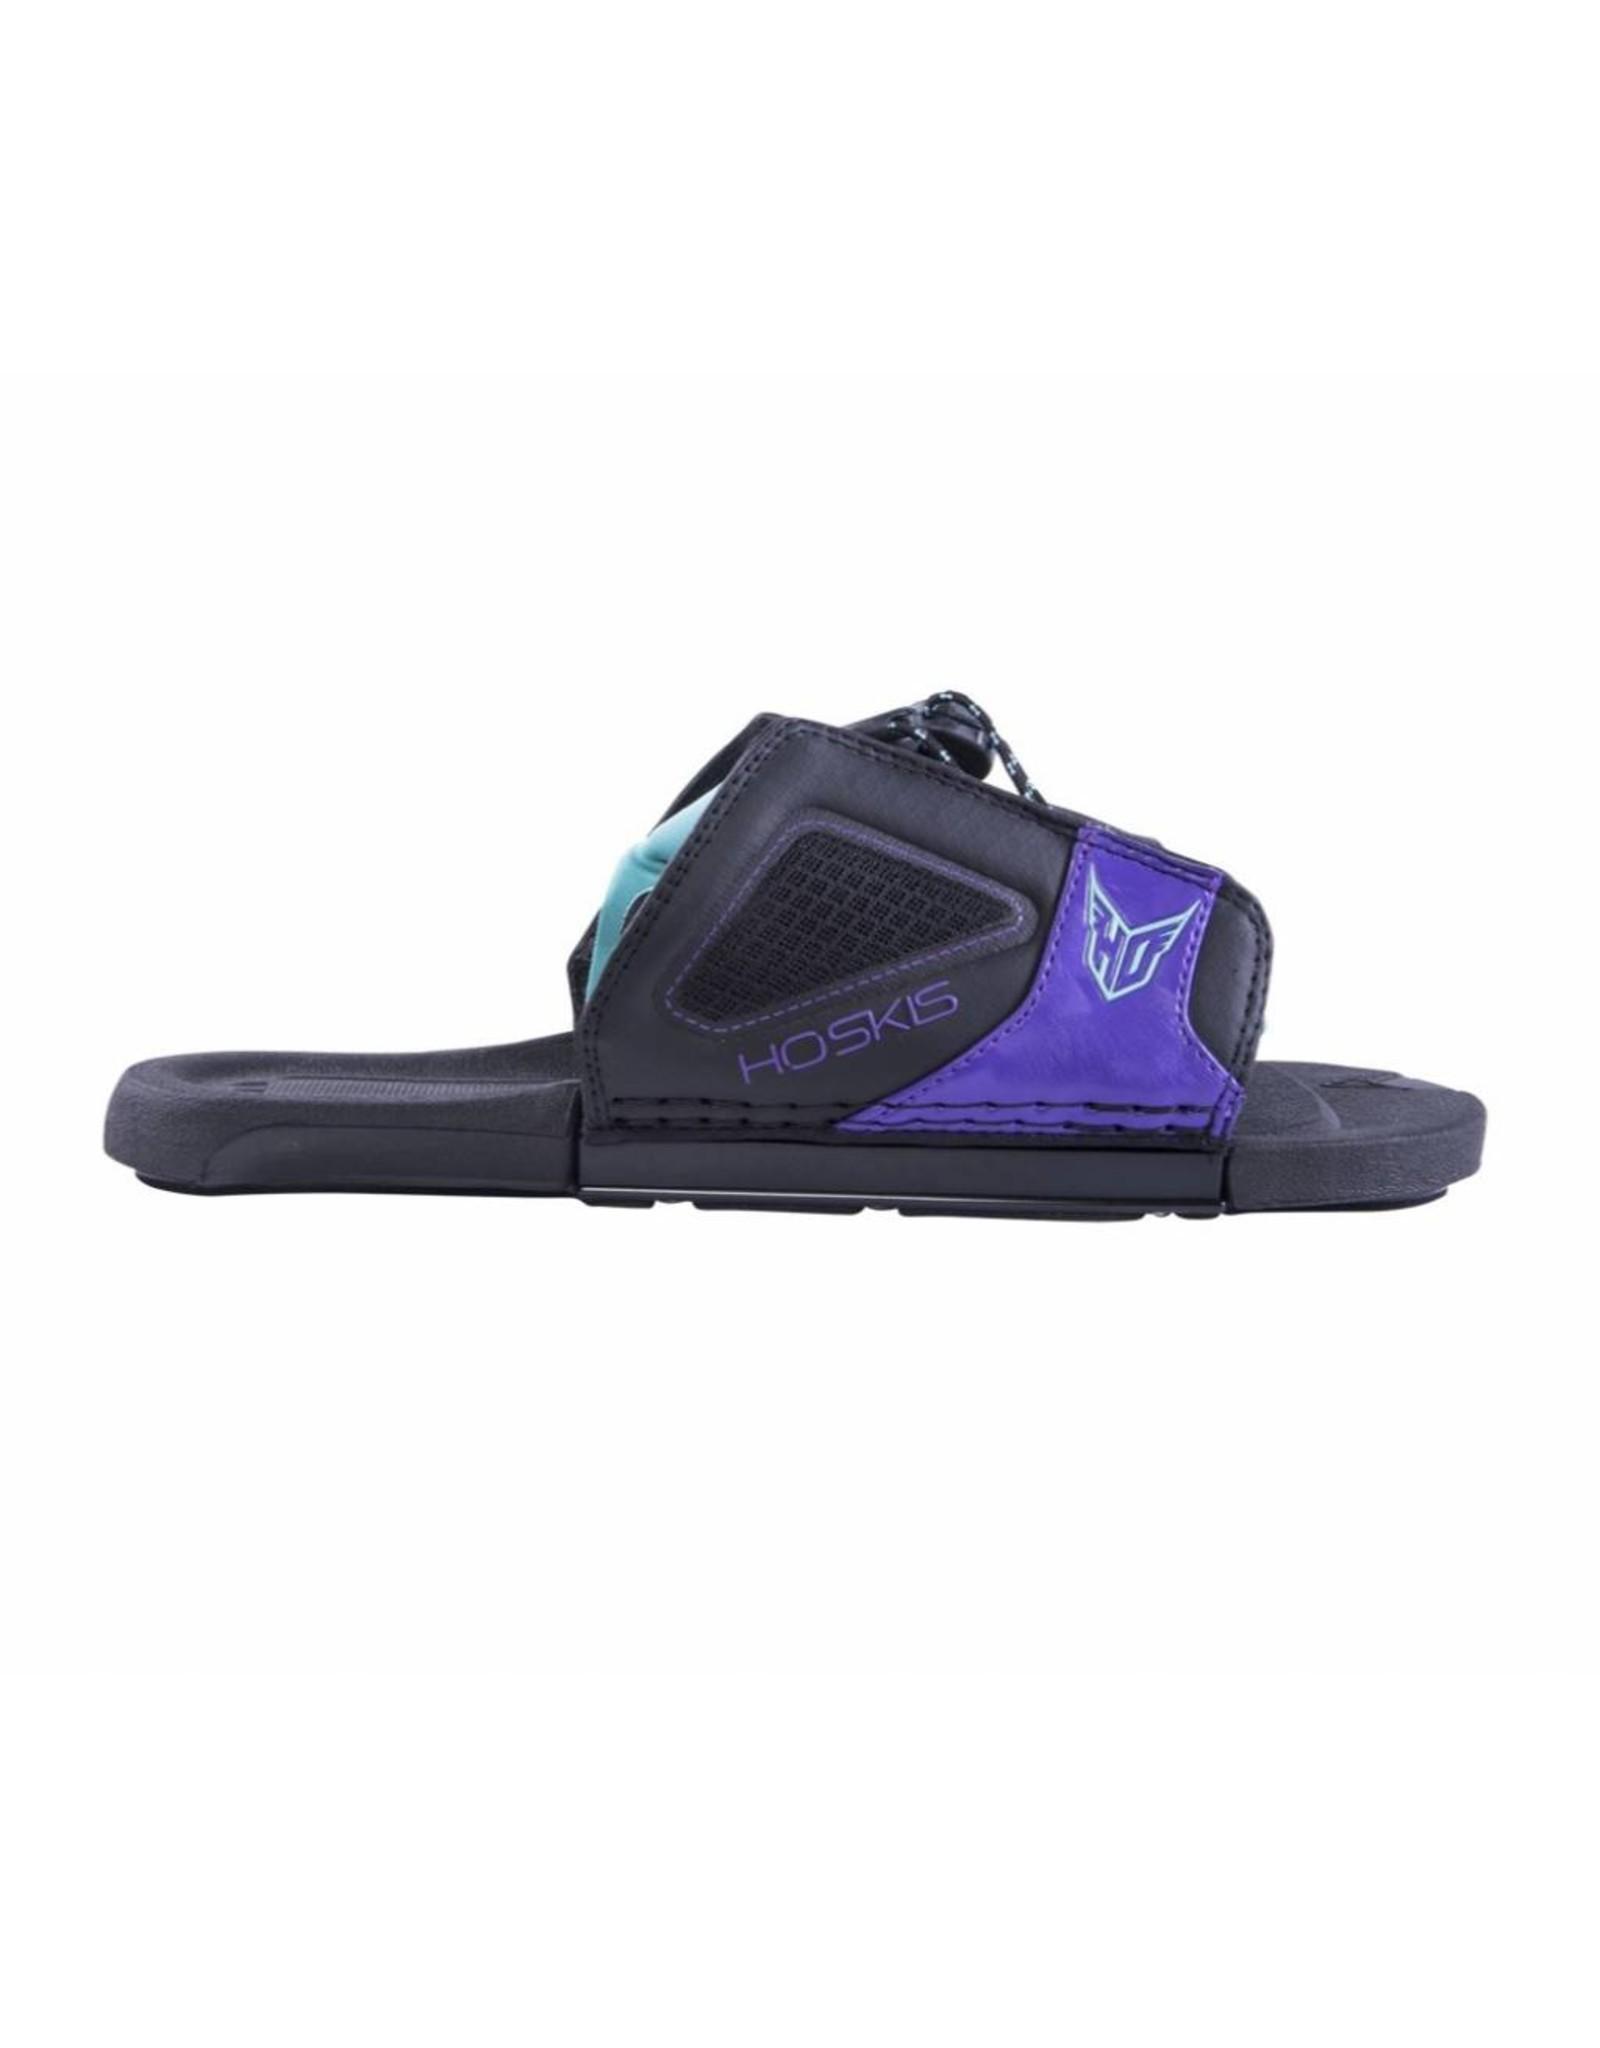 HO/Hyperlite Womens freeMAX Adjustable Rear Toe (ART) 2018